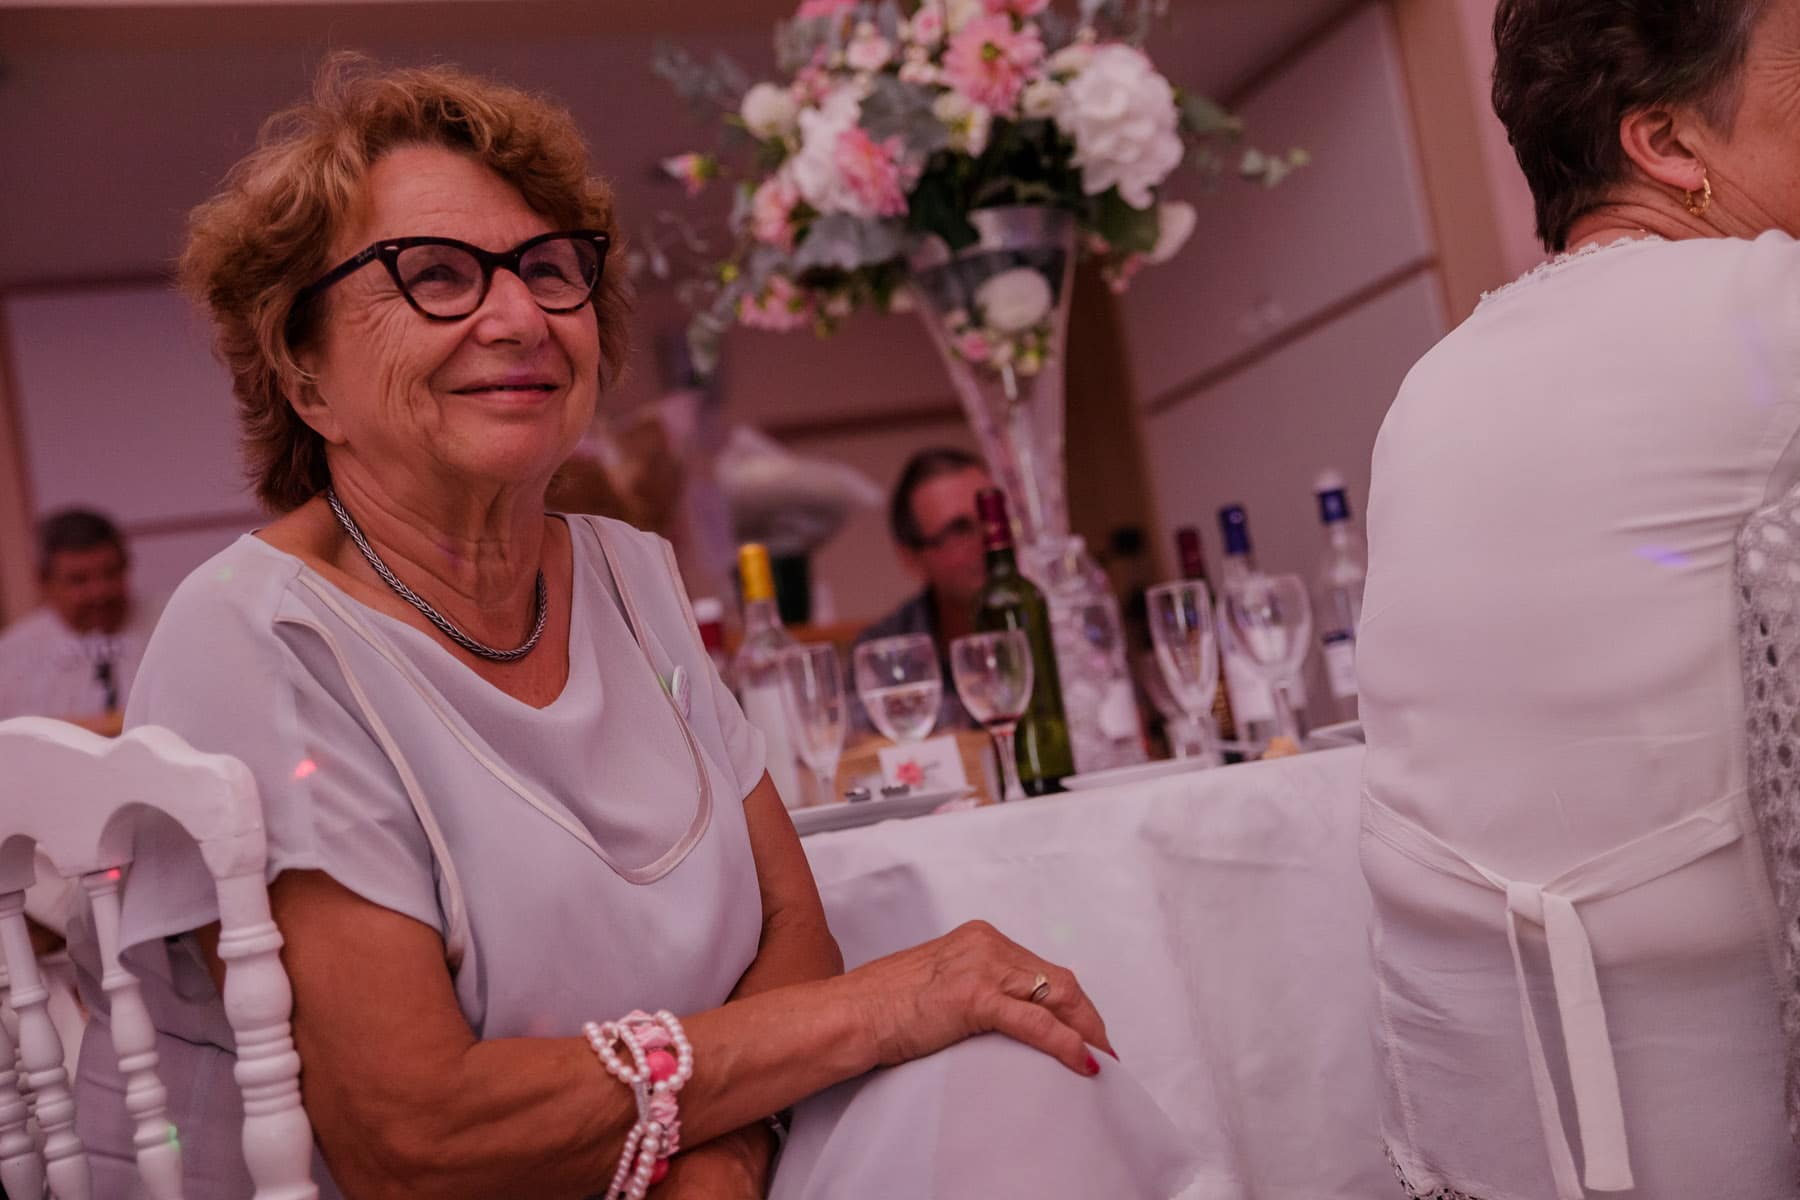 photographe mariage bordeaux landes fineart francais sarah miramon blog 49